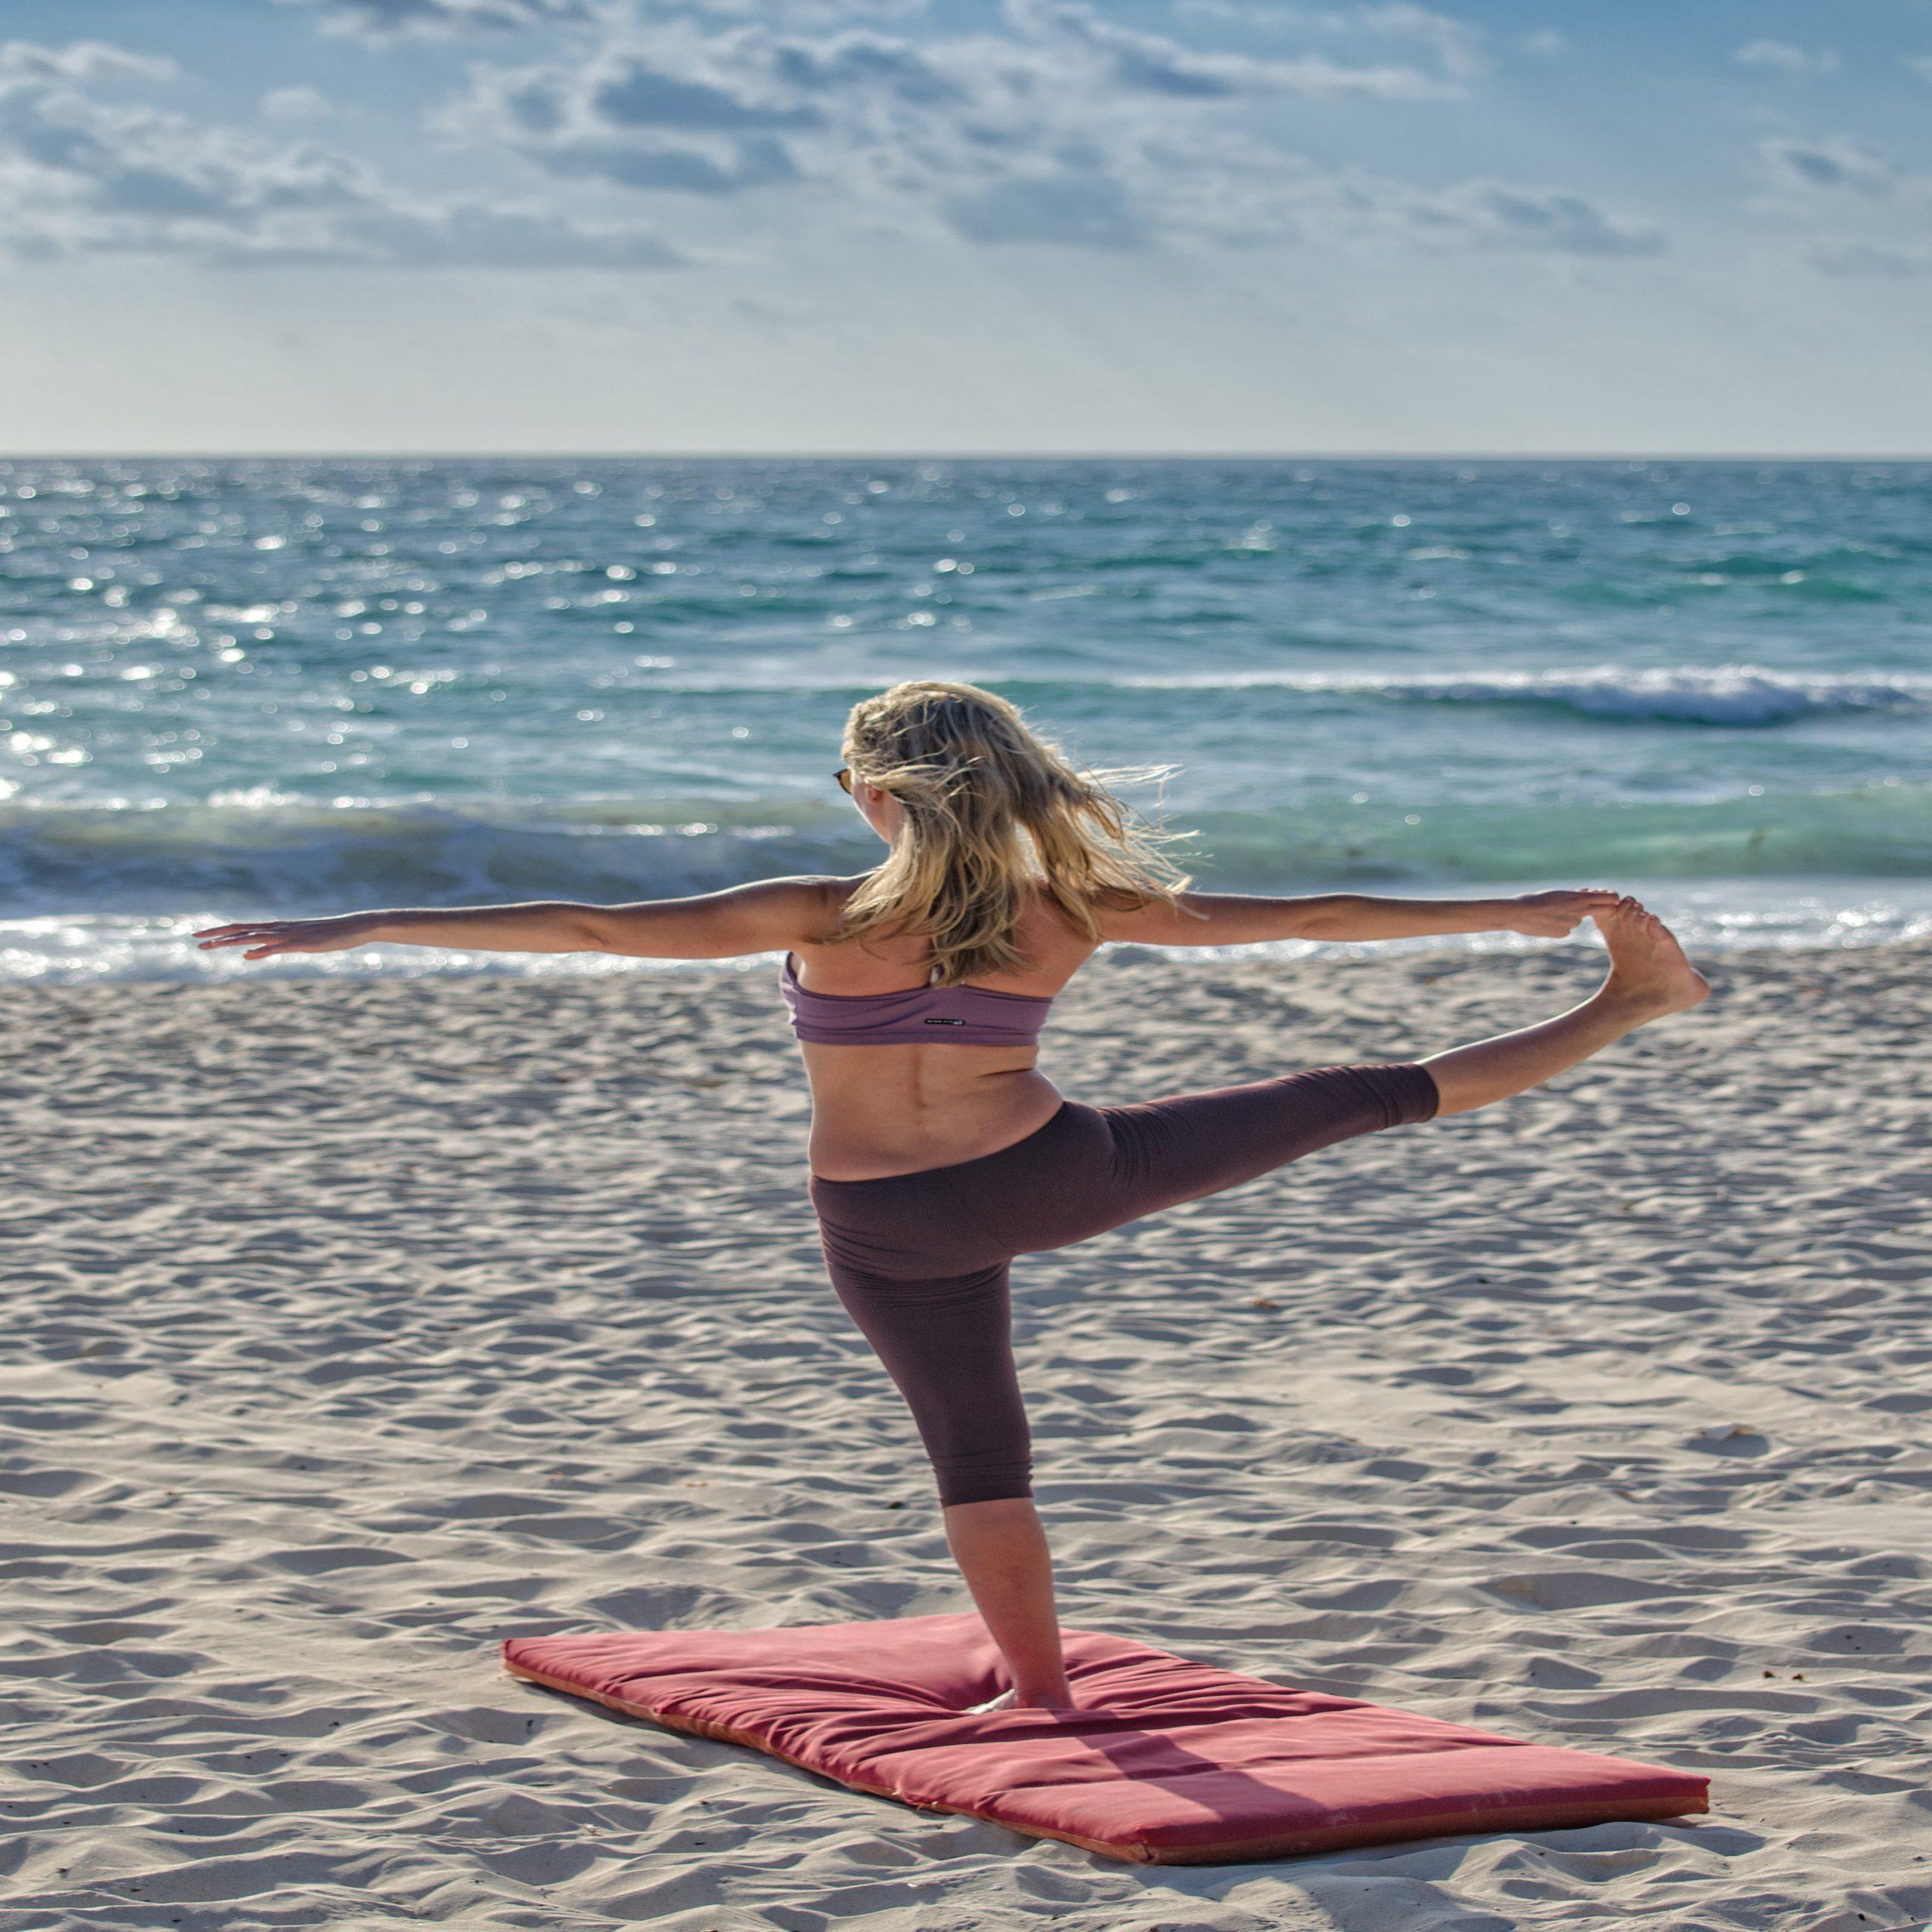 beach-sand-relaxation-sunshine-68468